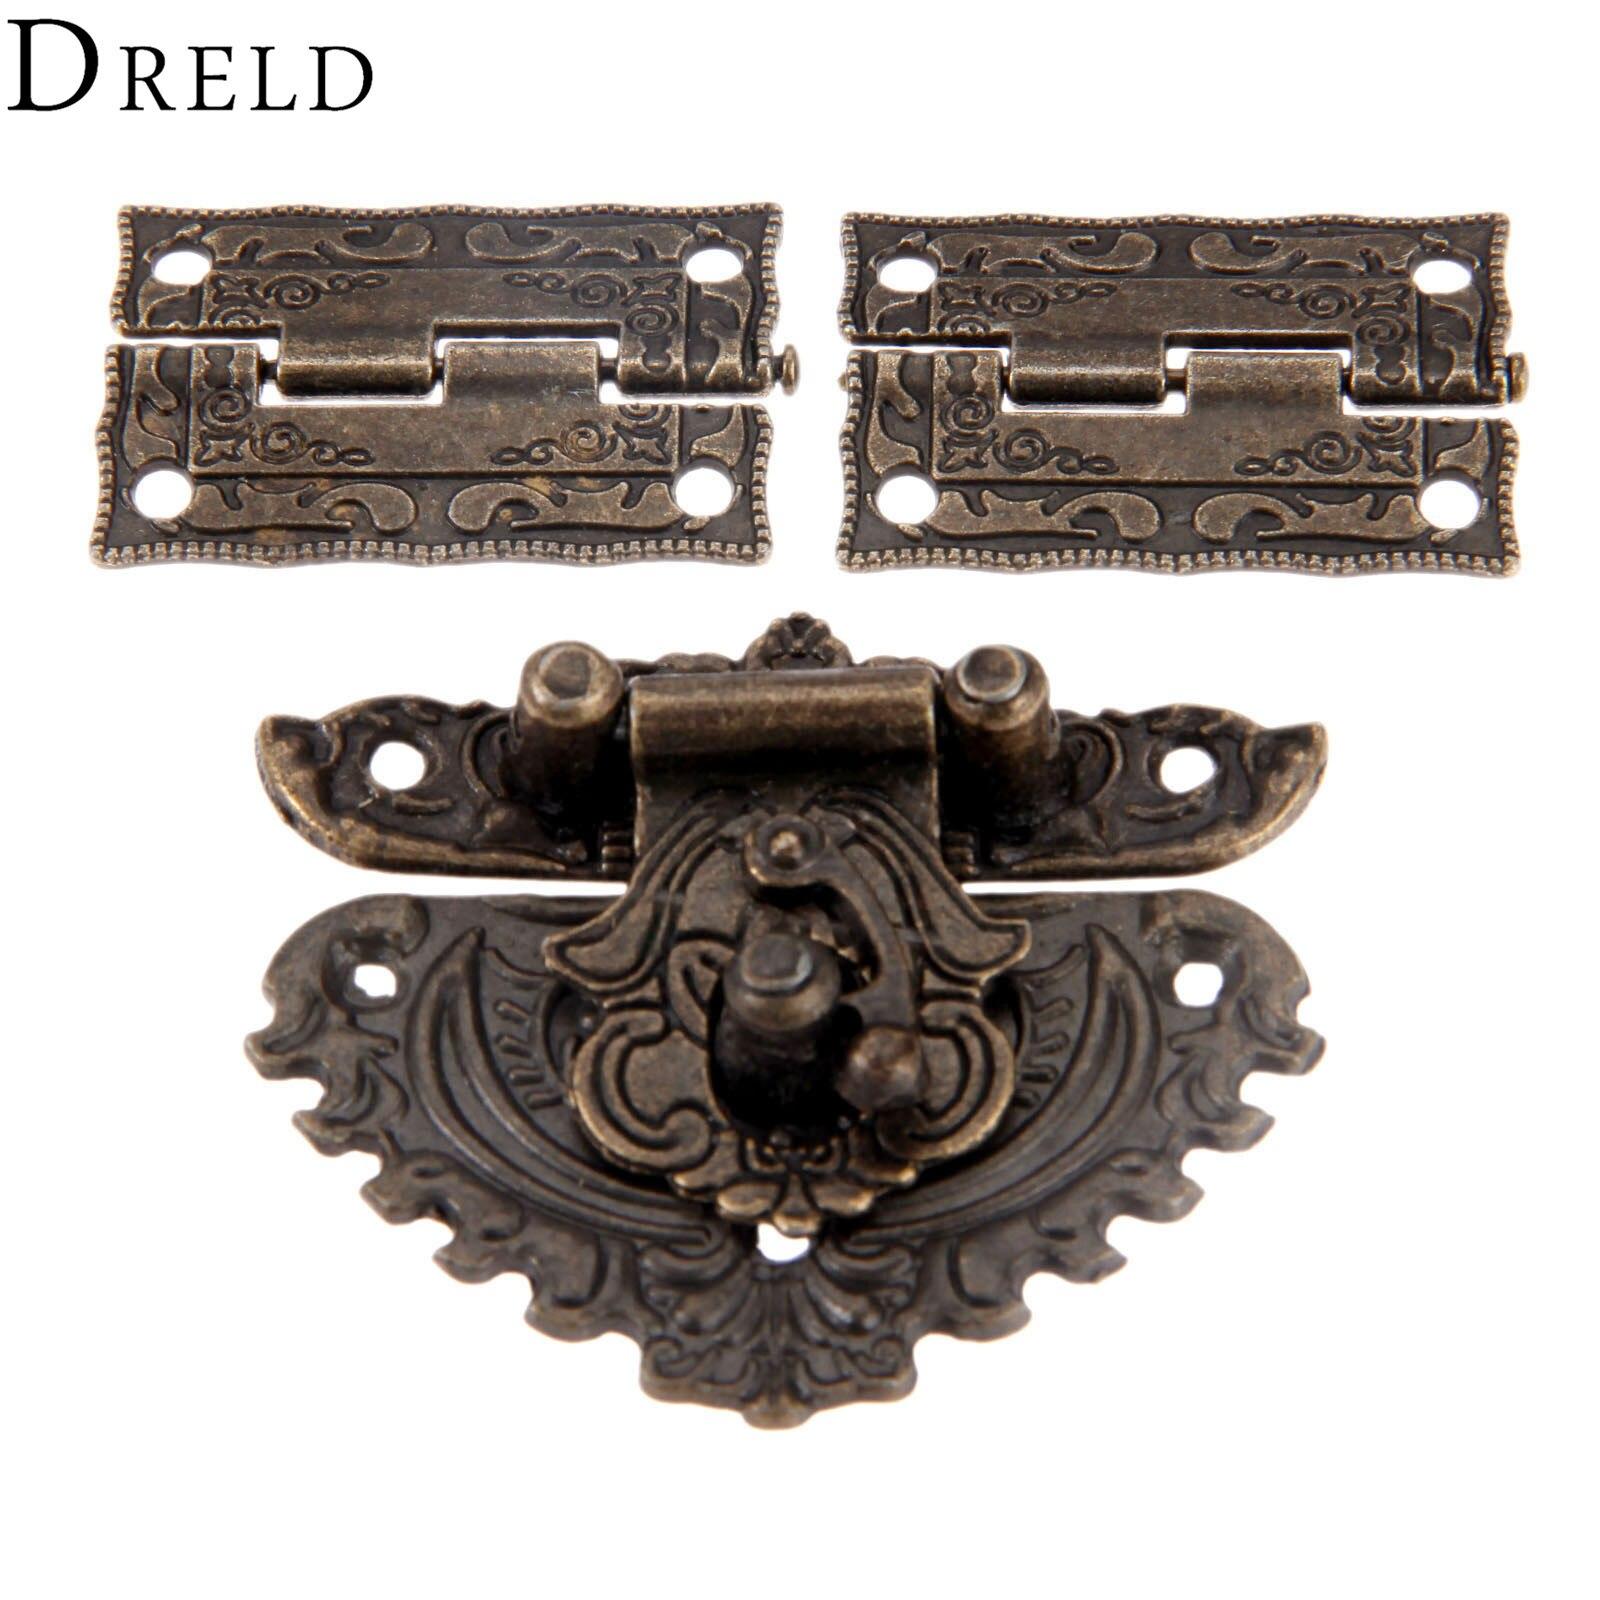 DRELD Antique Bronze Furniture Hardware Box Latch Hasp Toggle Buckle + 2Pcs Decorative Cabinet Hinge